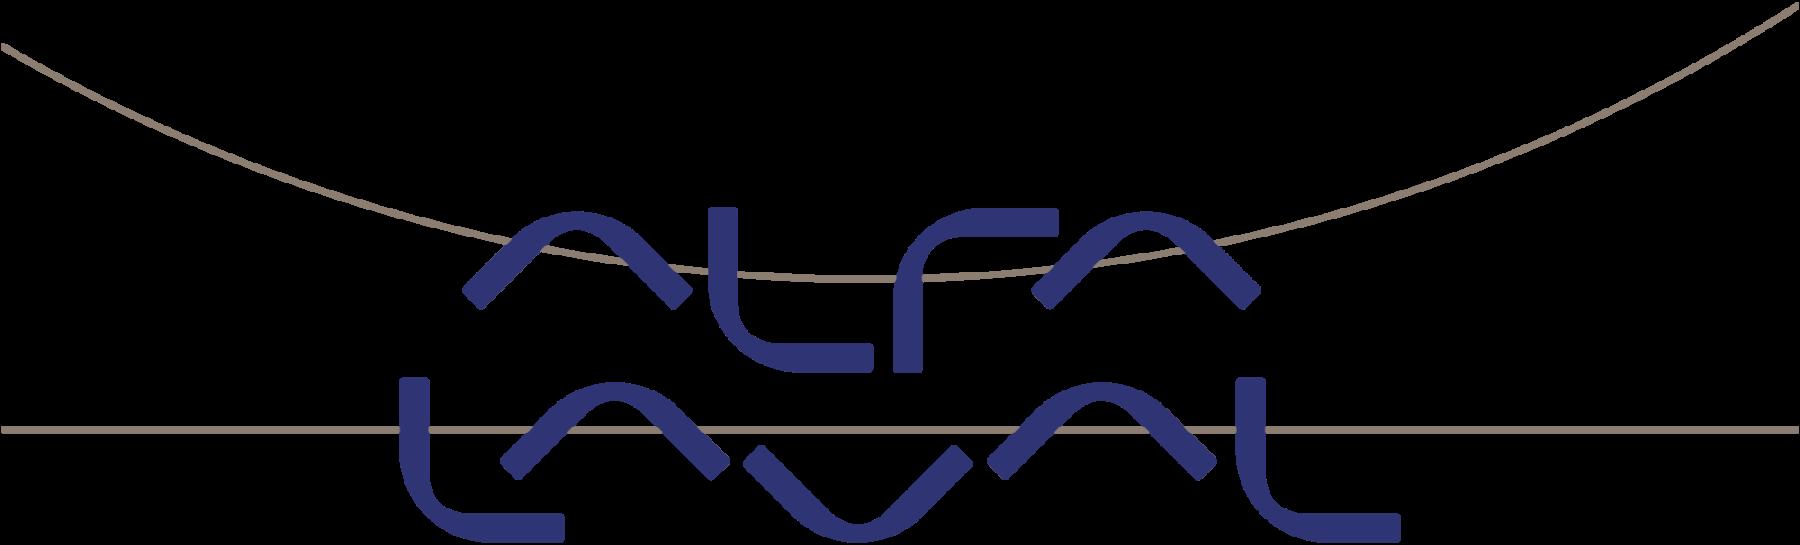 AlfaLaval logo